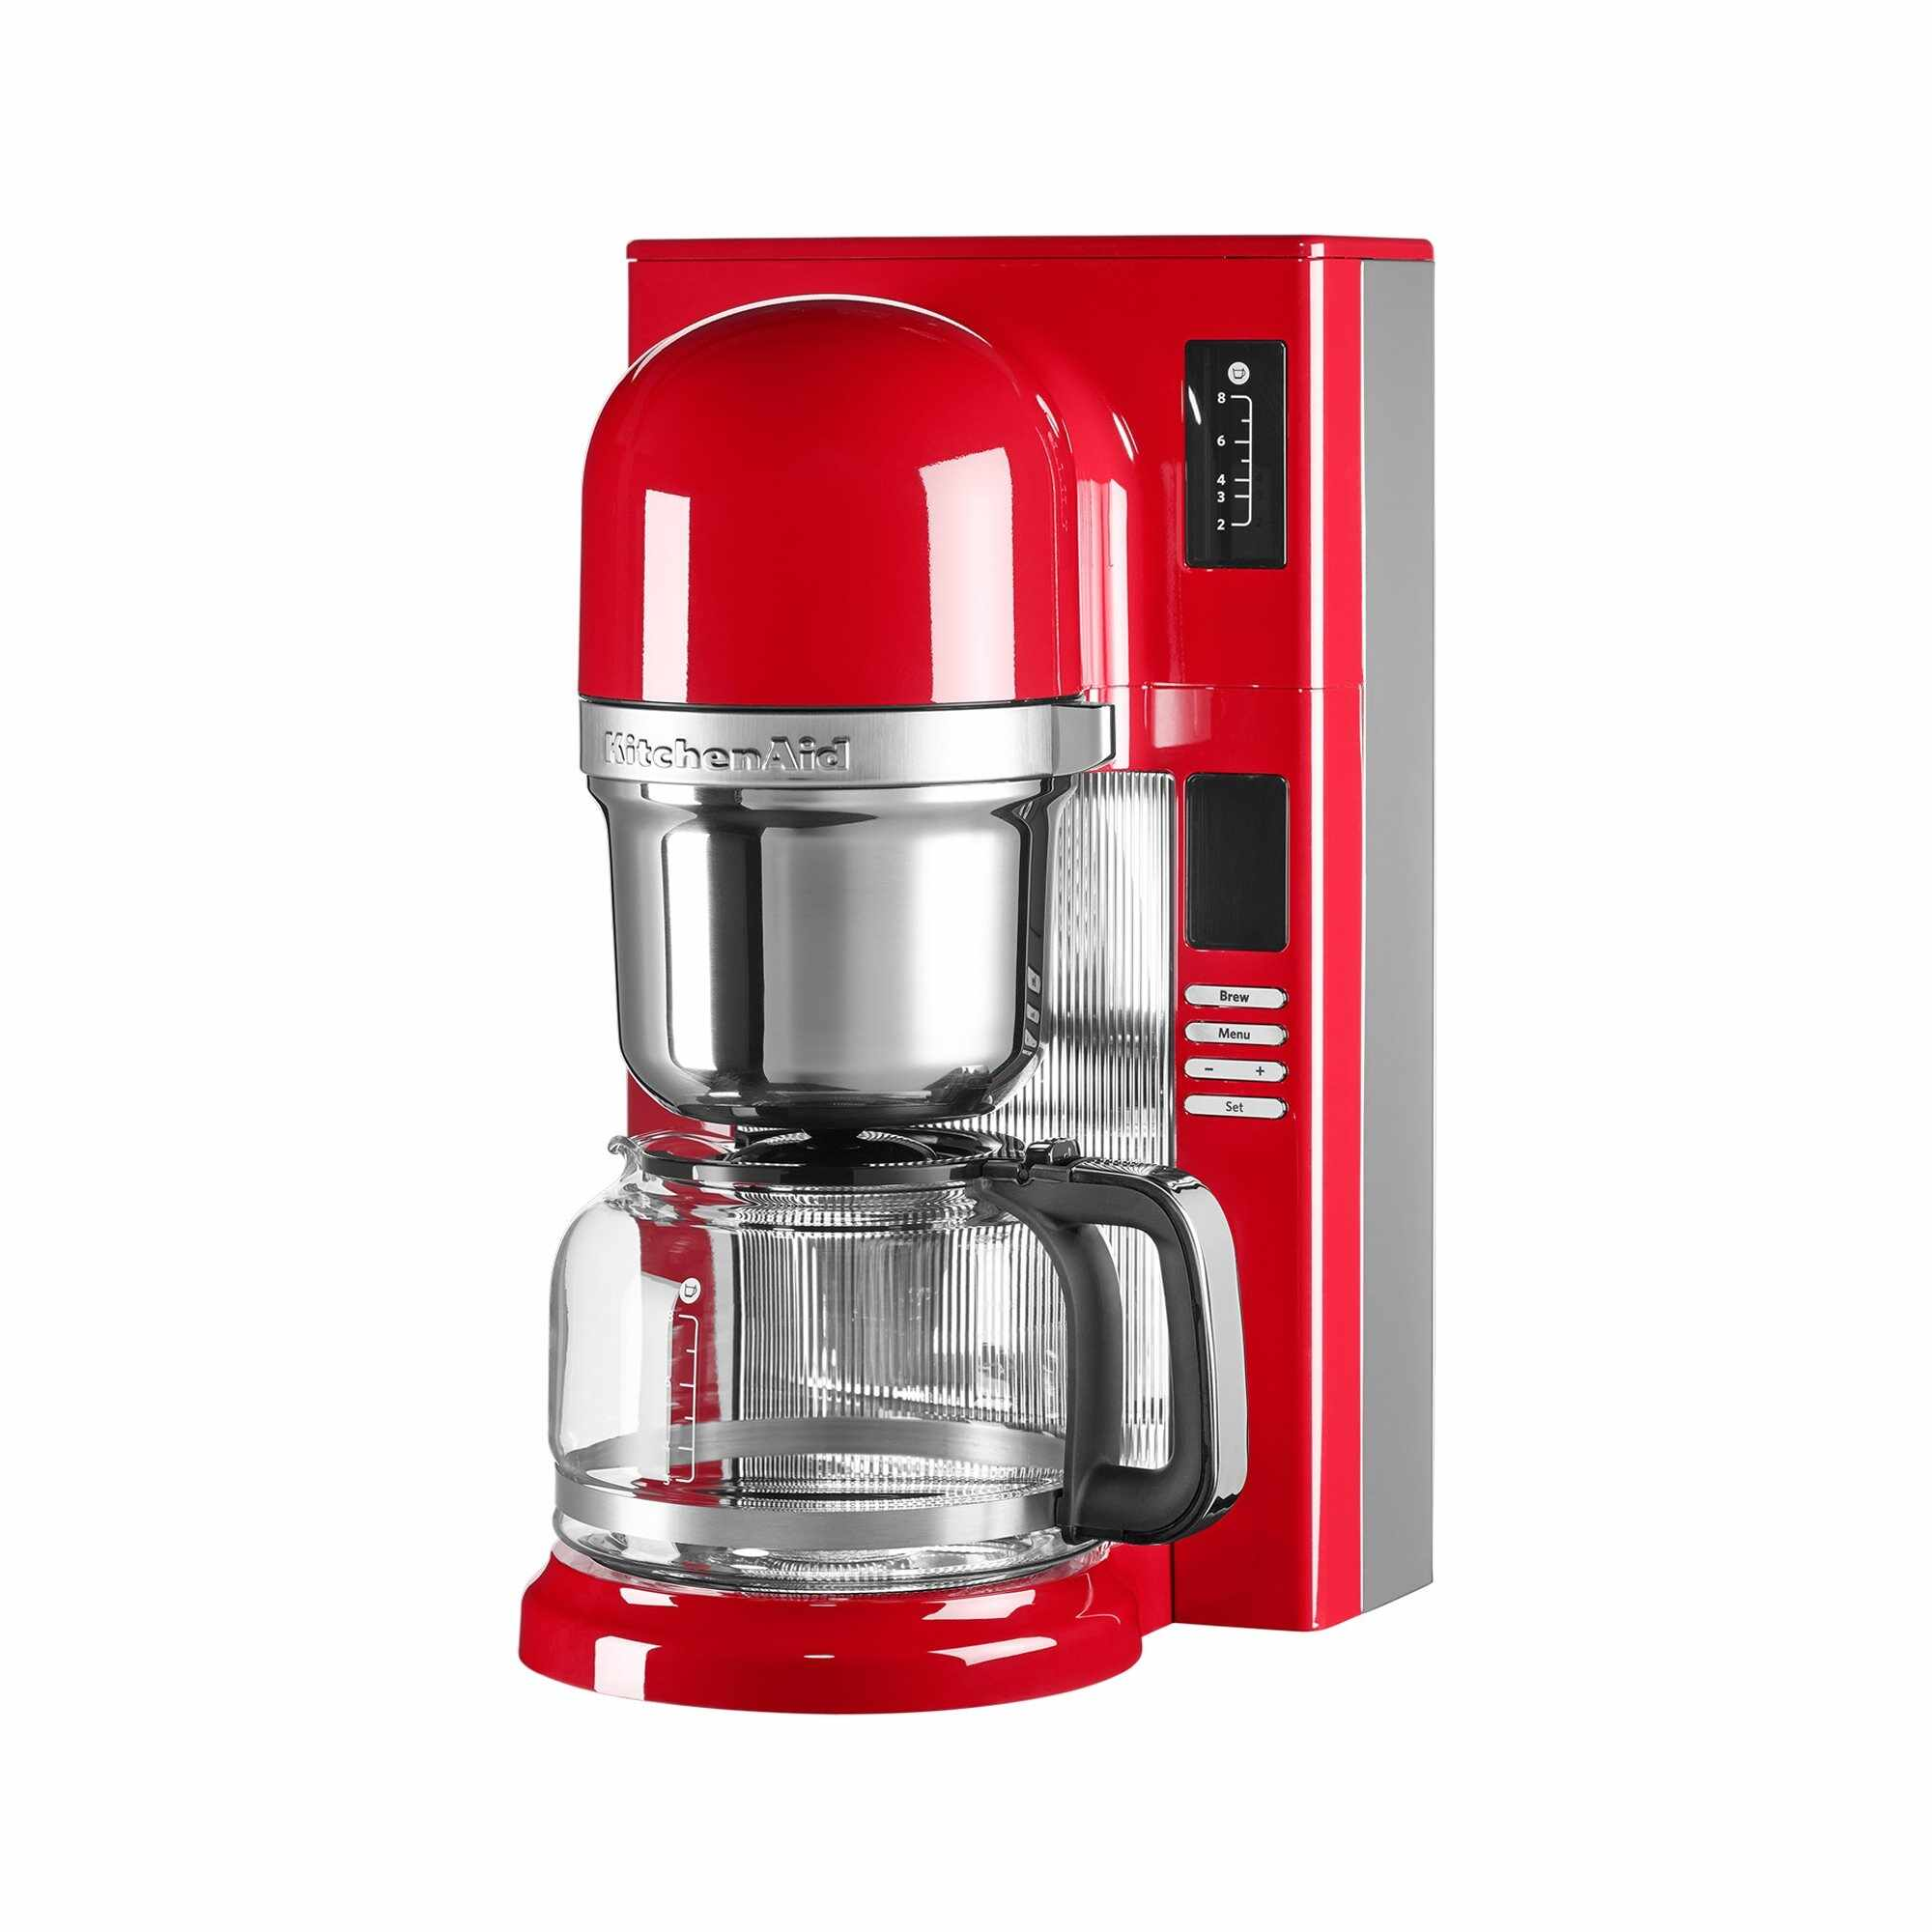 Cafetiera programabila 5KCM0802E, 1,2 L, 1250W, KitchenAid la pret 1199 lei